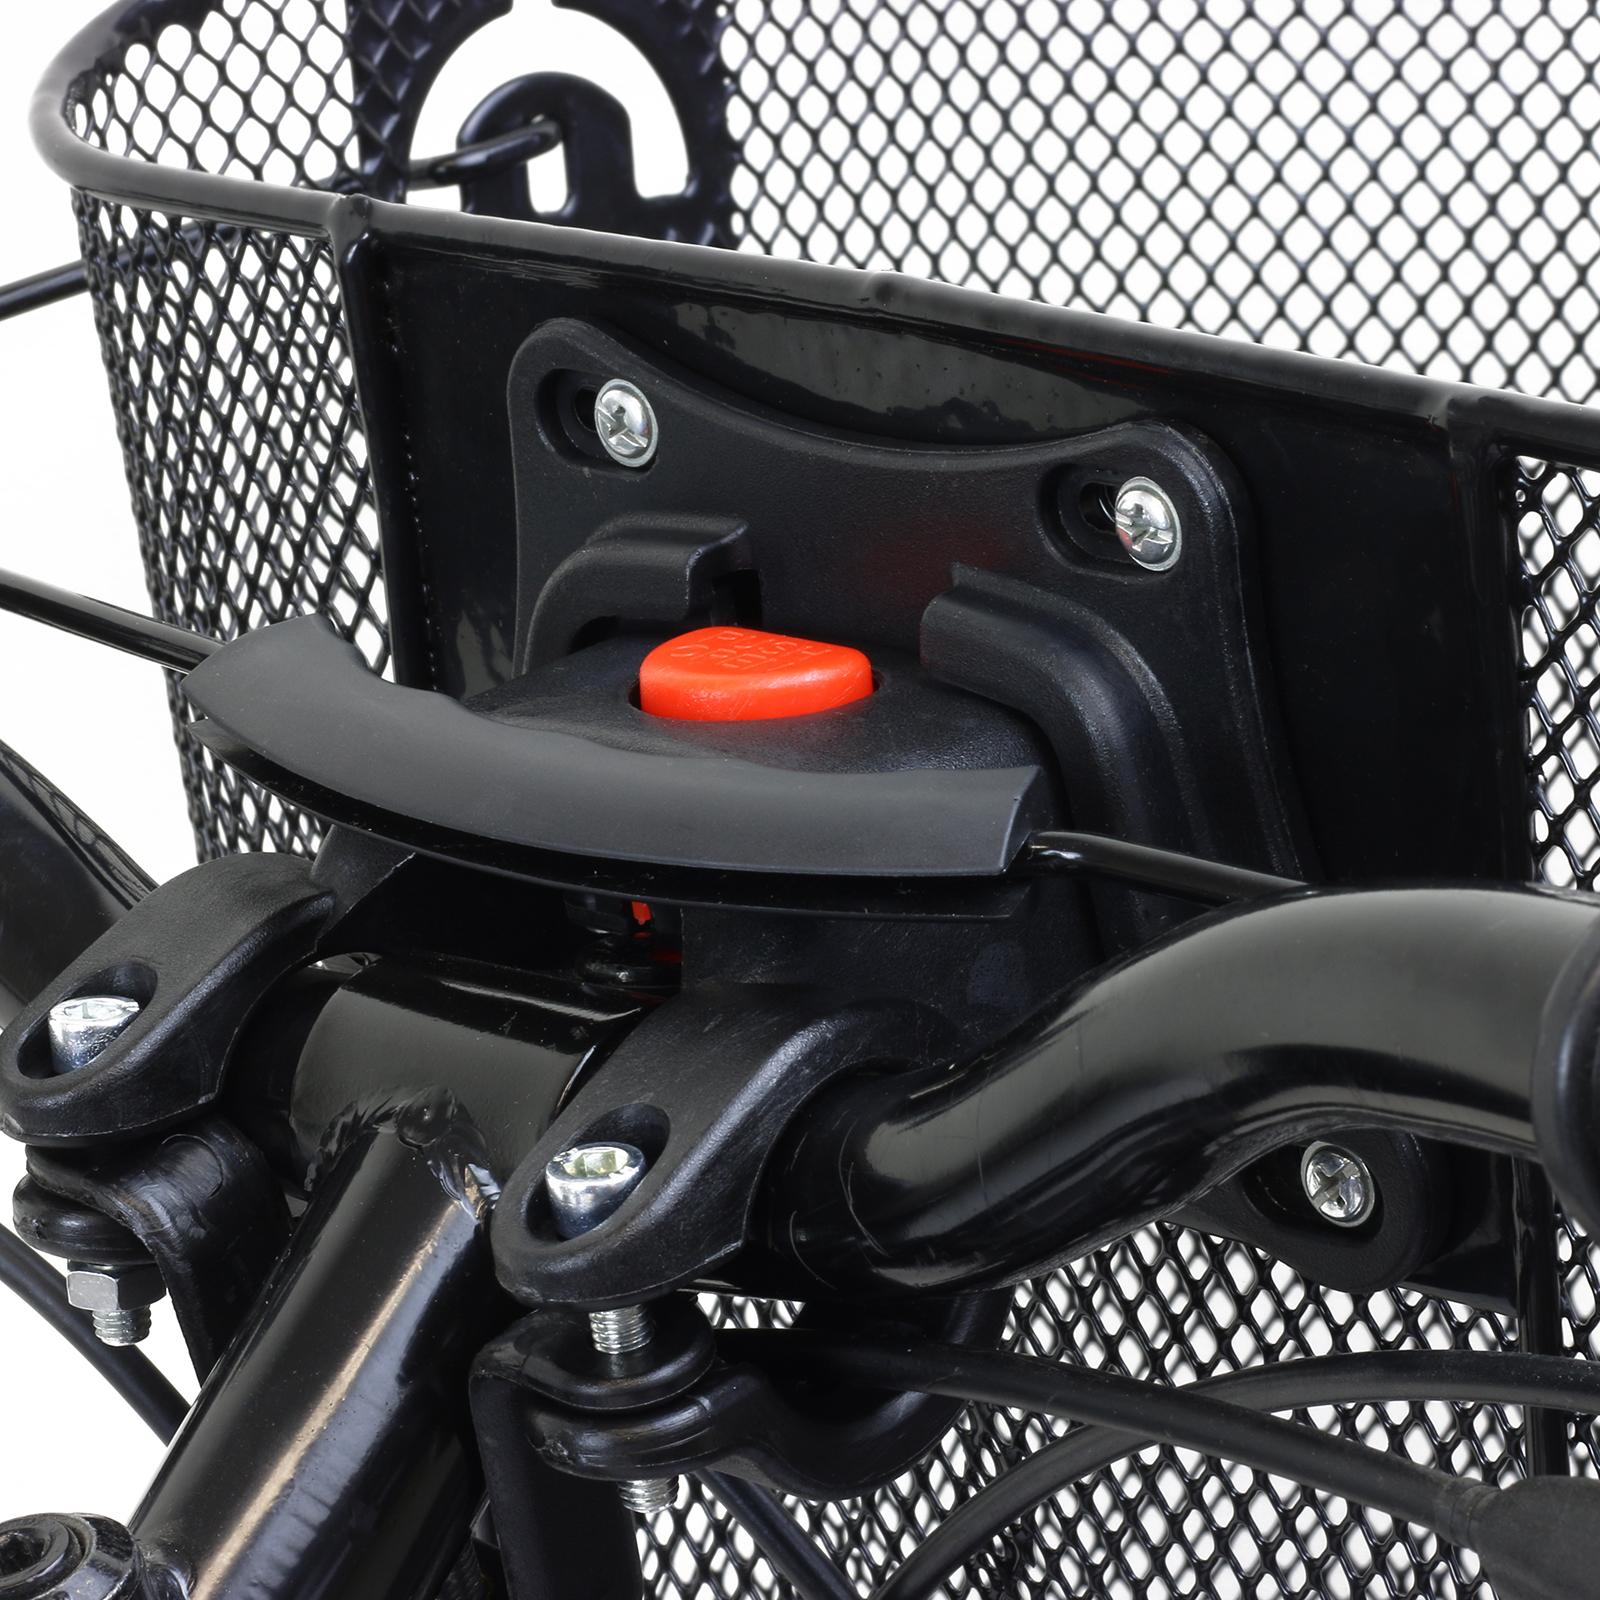 Bike//Bicycle//Cycle Metal Mesh Basket /& Quick Release Bracket Shopping Handle